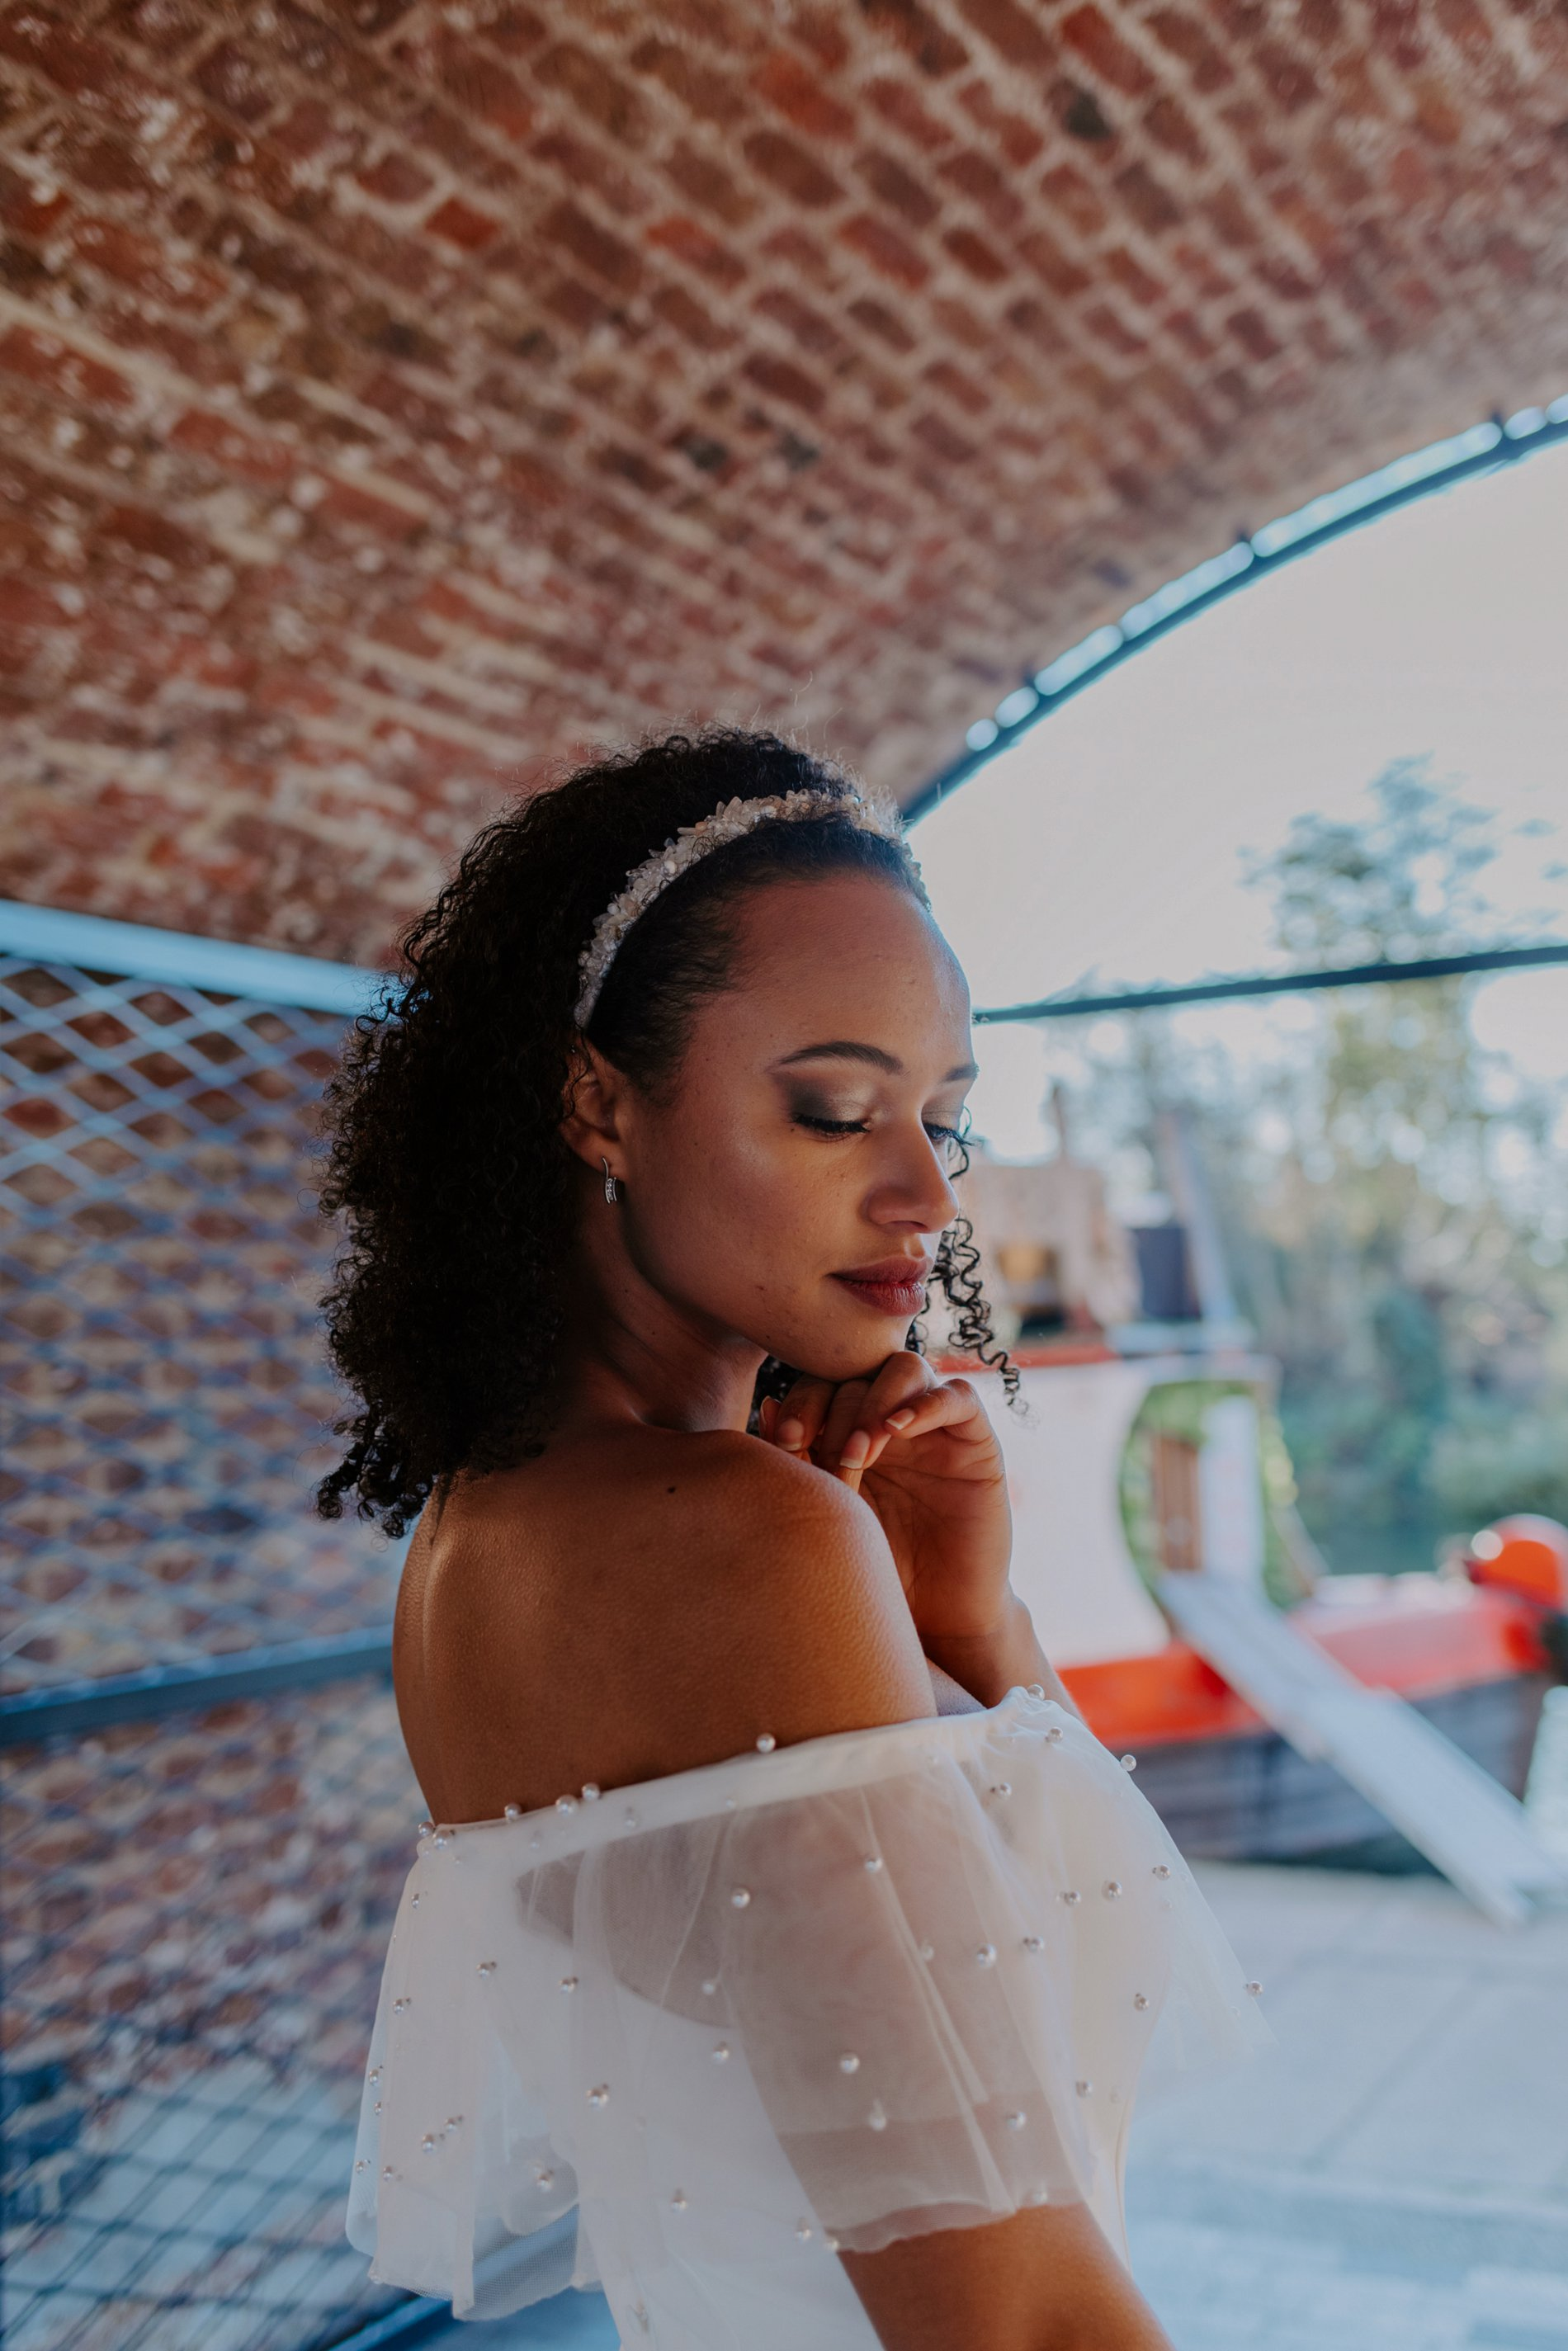 City Wedding Styled Shoot at Coal Drops Yard (c) Emztography (36)